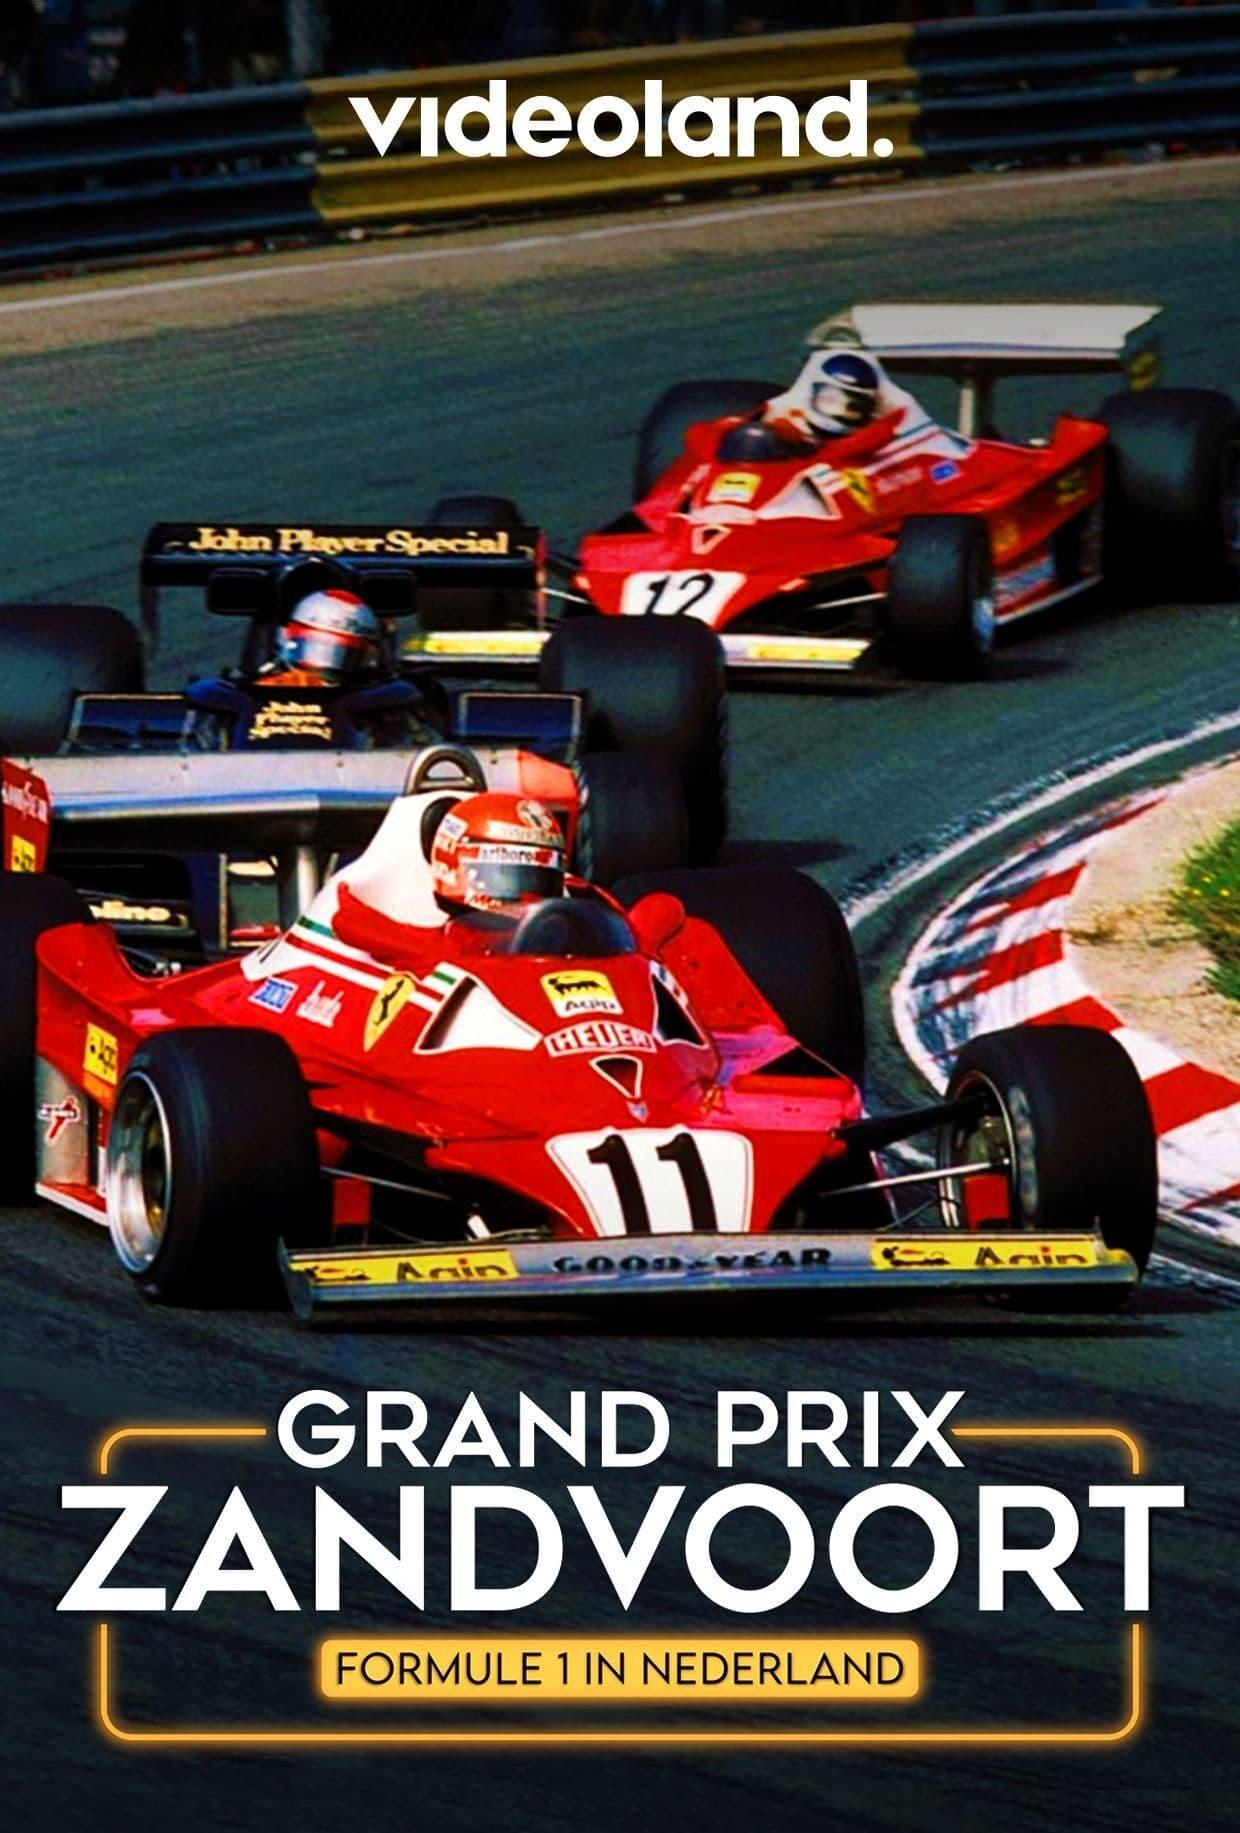 Grand Prix Zandvoort TV Shows About Sports